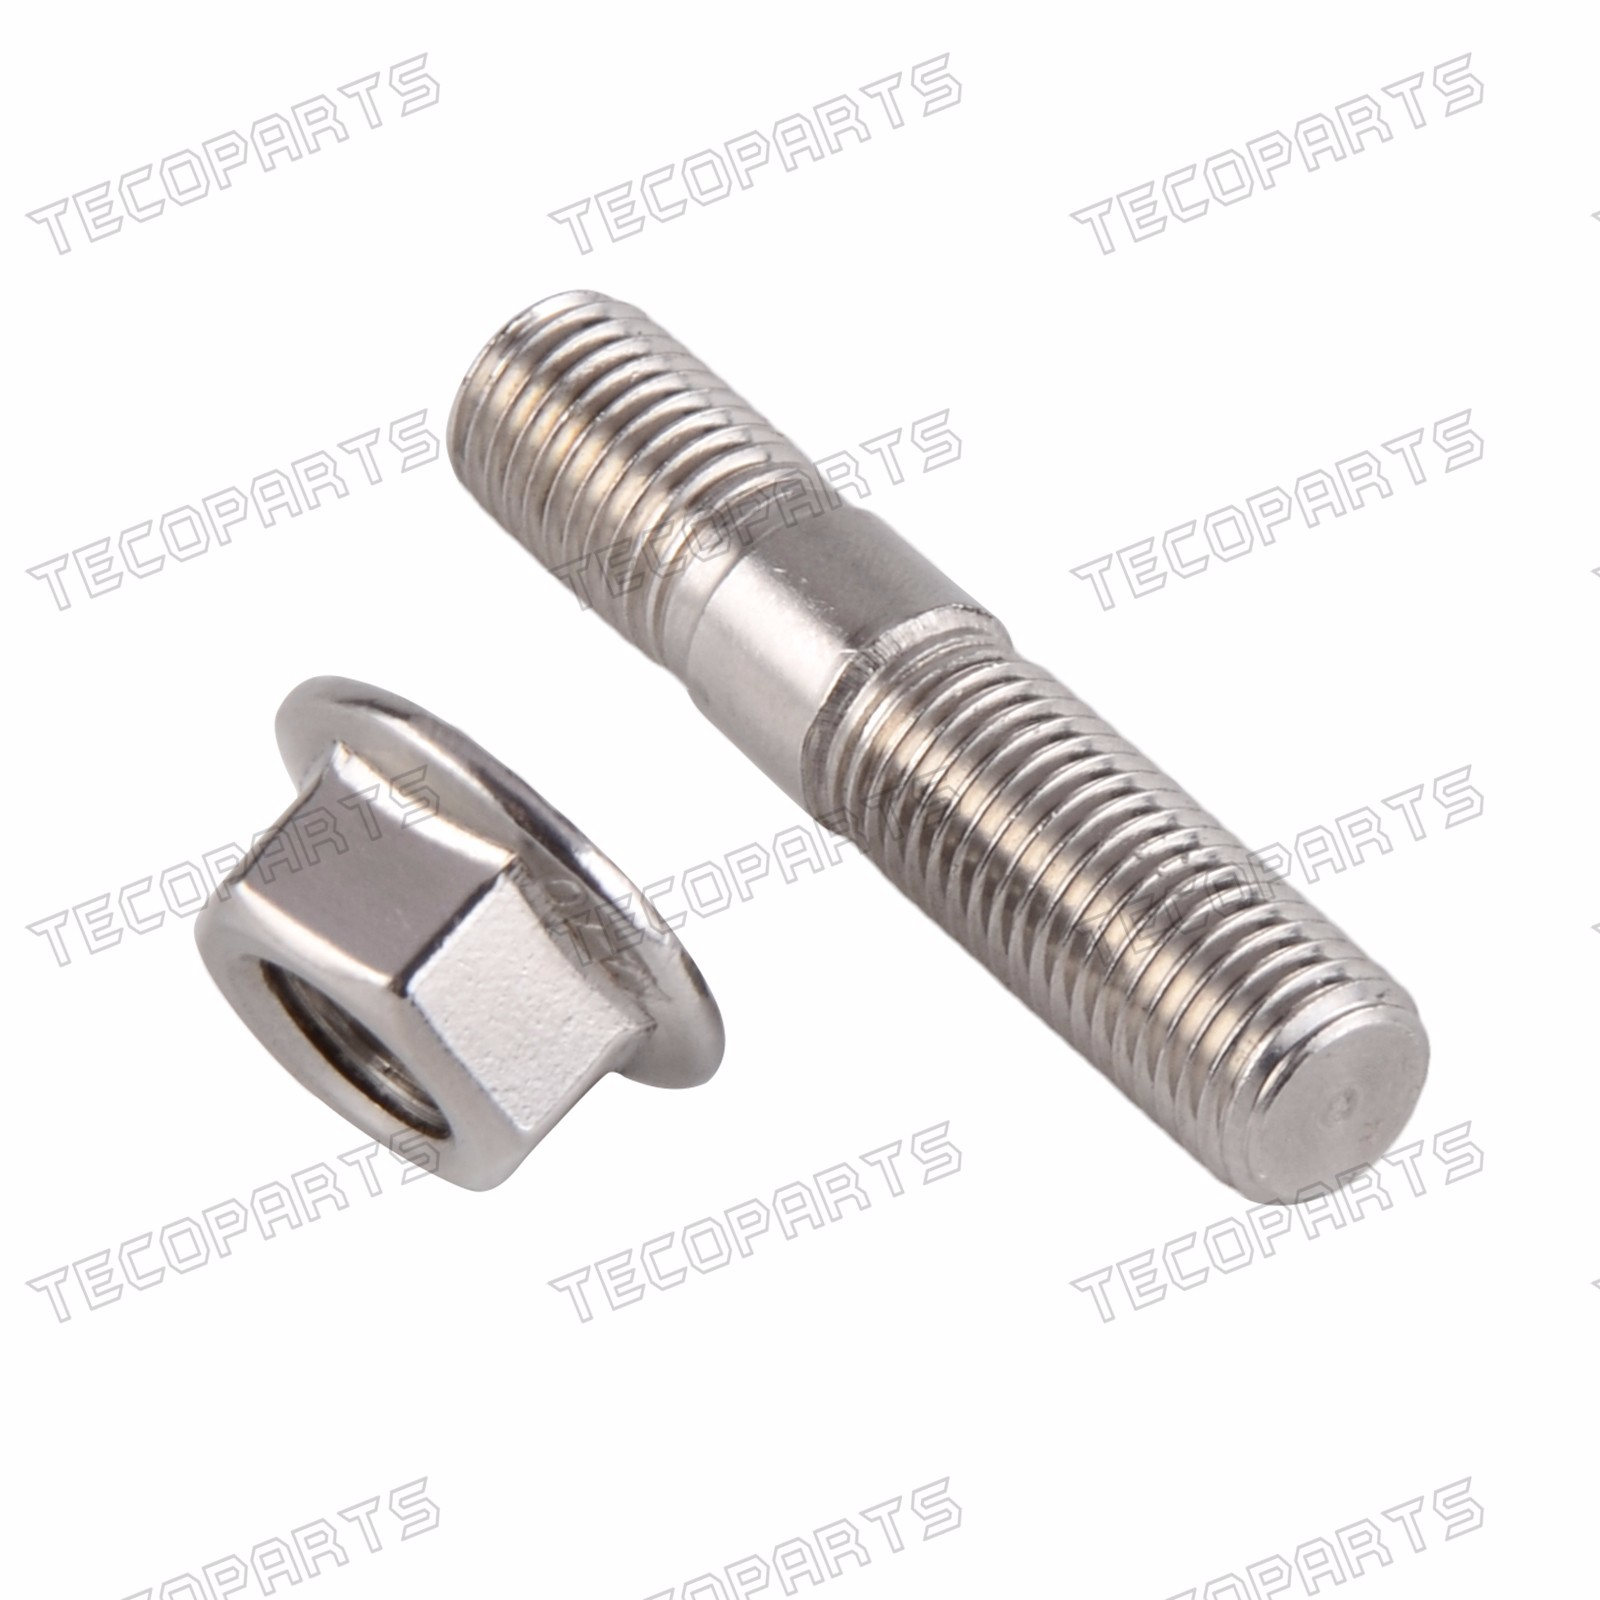 8x M10x1.25 Exhaust Stud /& Serrated Nuts Manifold Flange For Toyota Nissan Honda